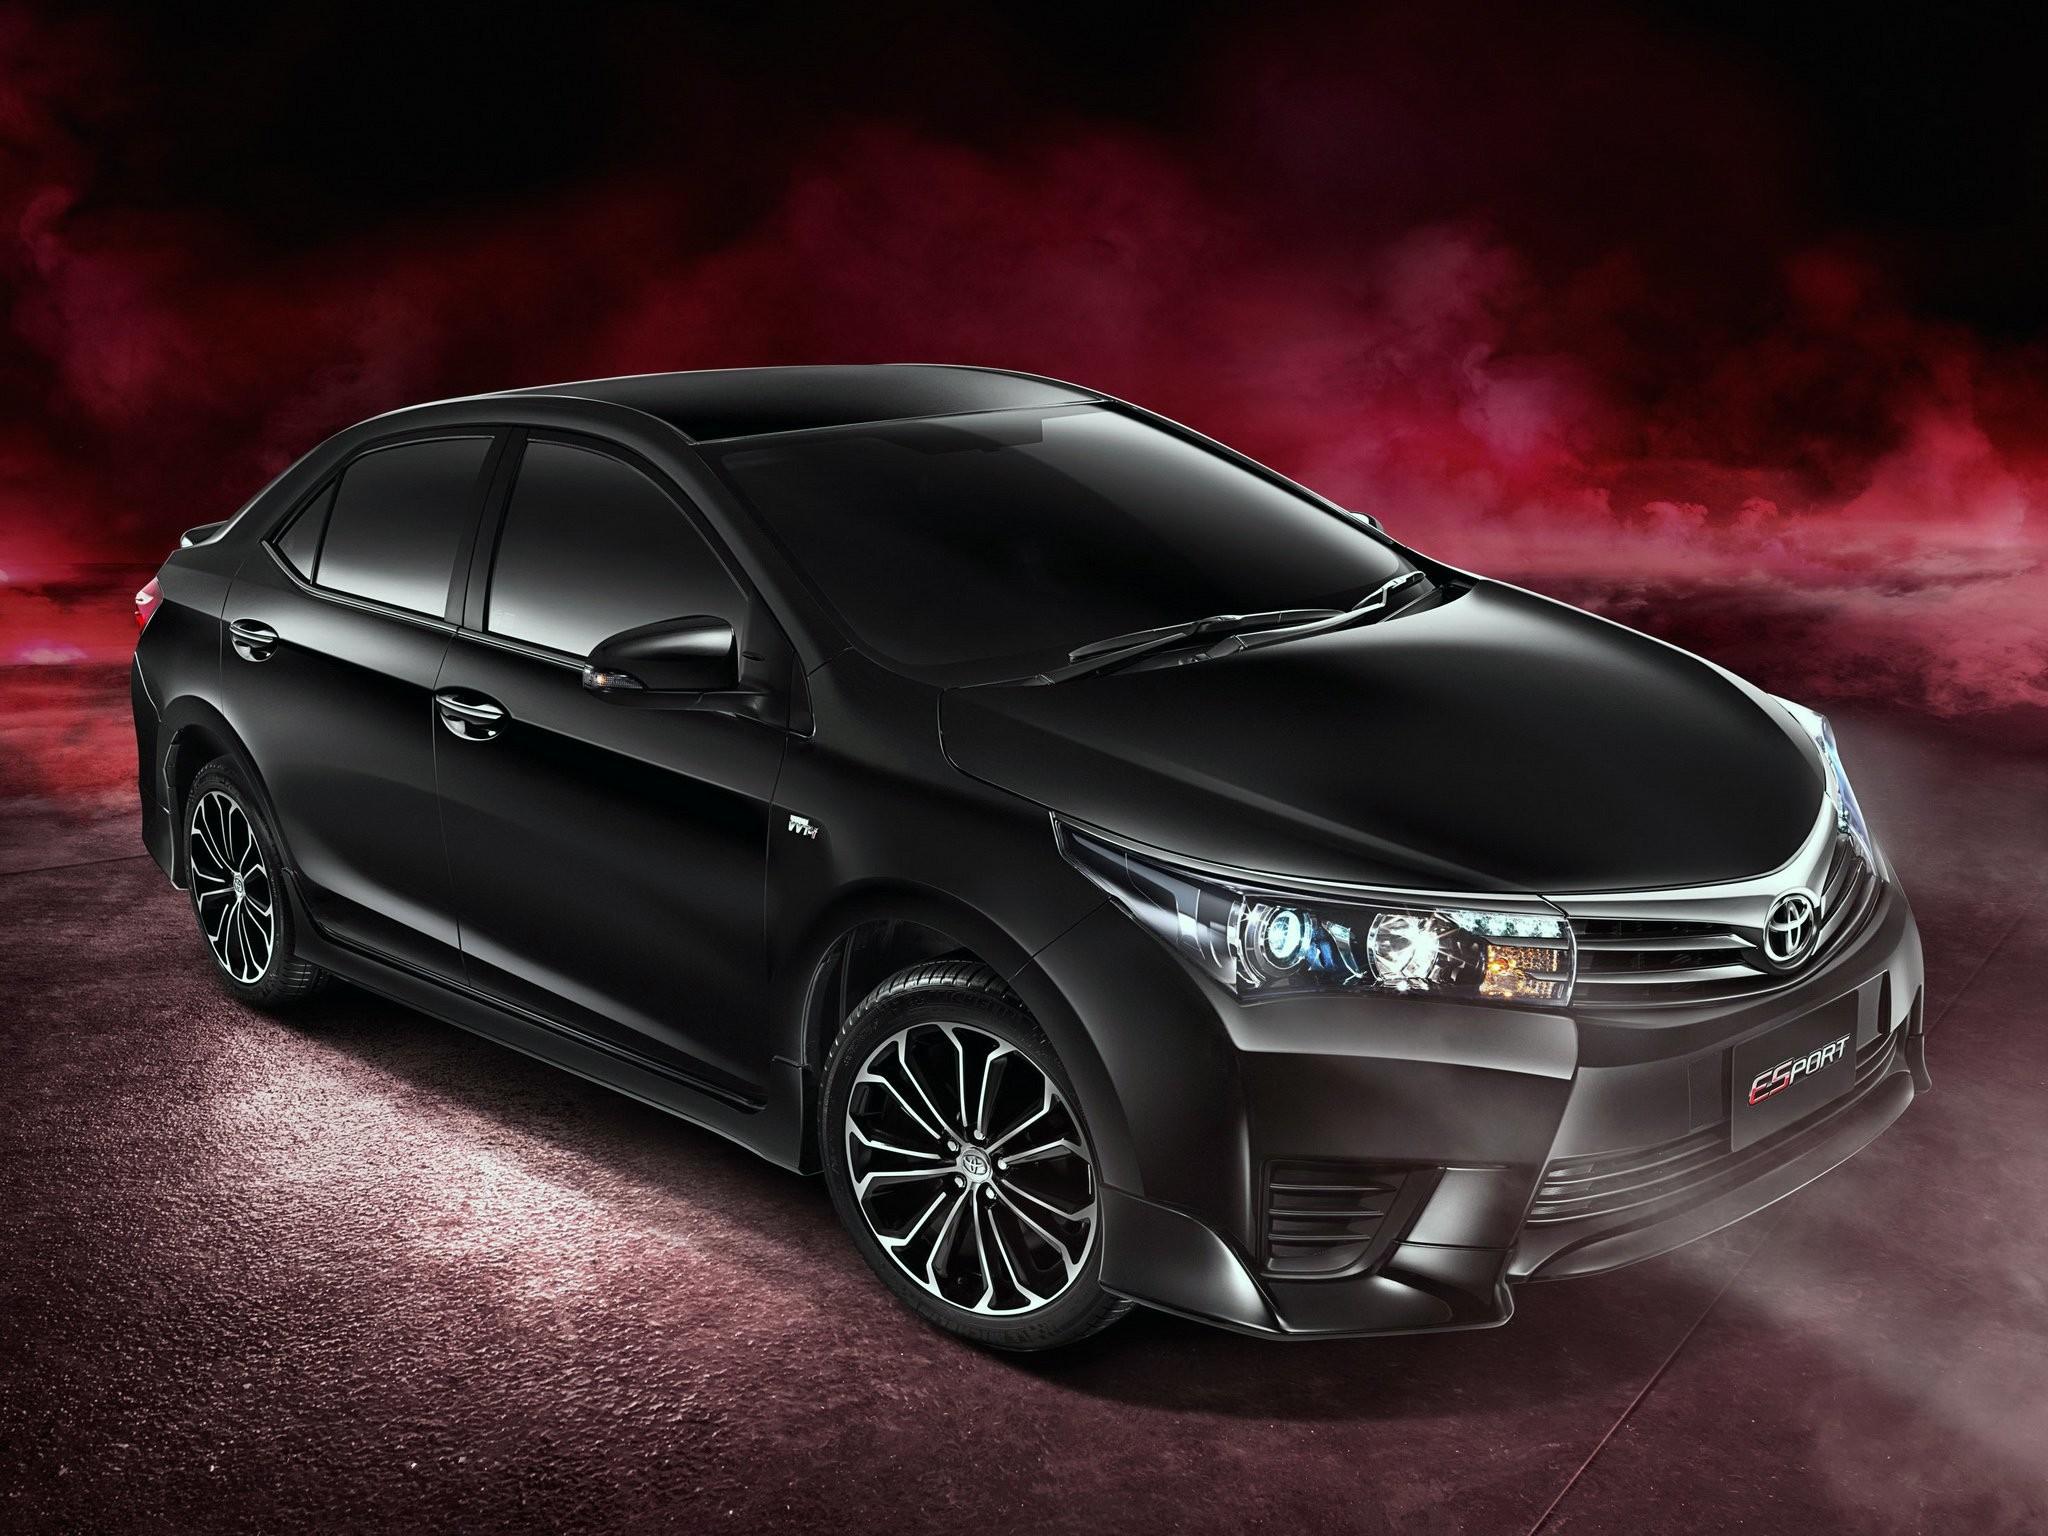 2017 Toyota Corolla Le Eco >> Toyota Corolla Wallpapers ·① WallpaperTag